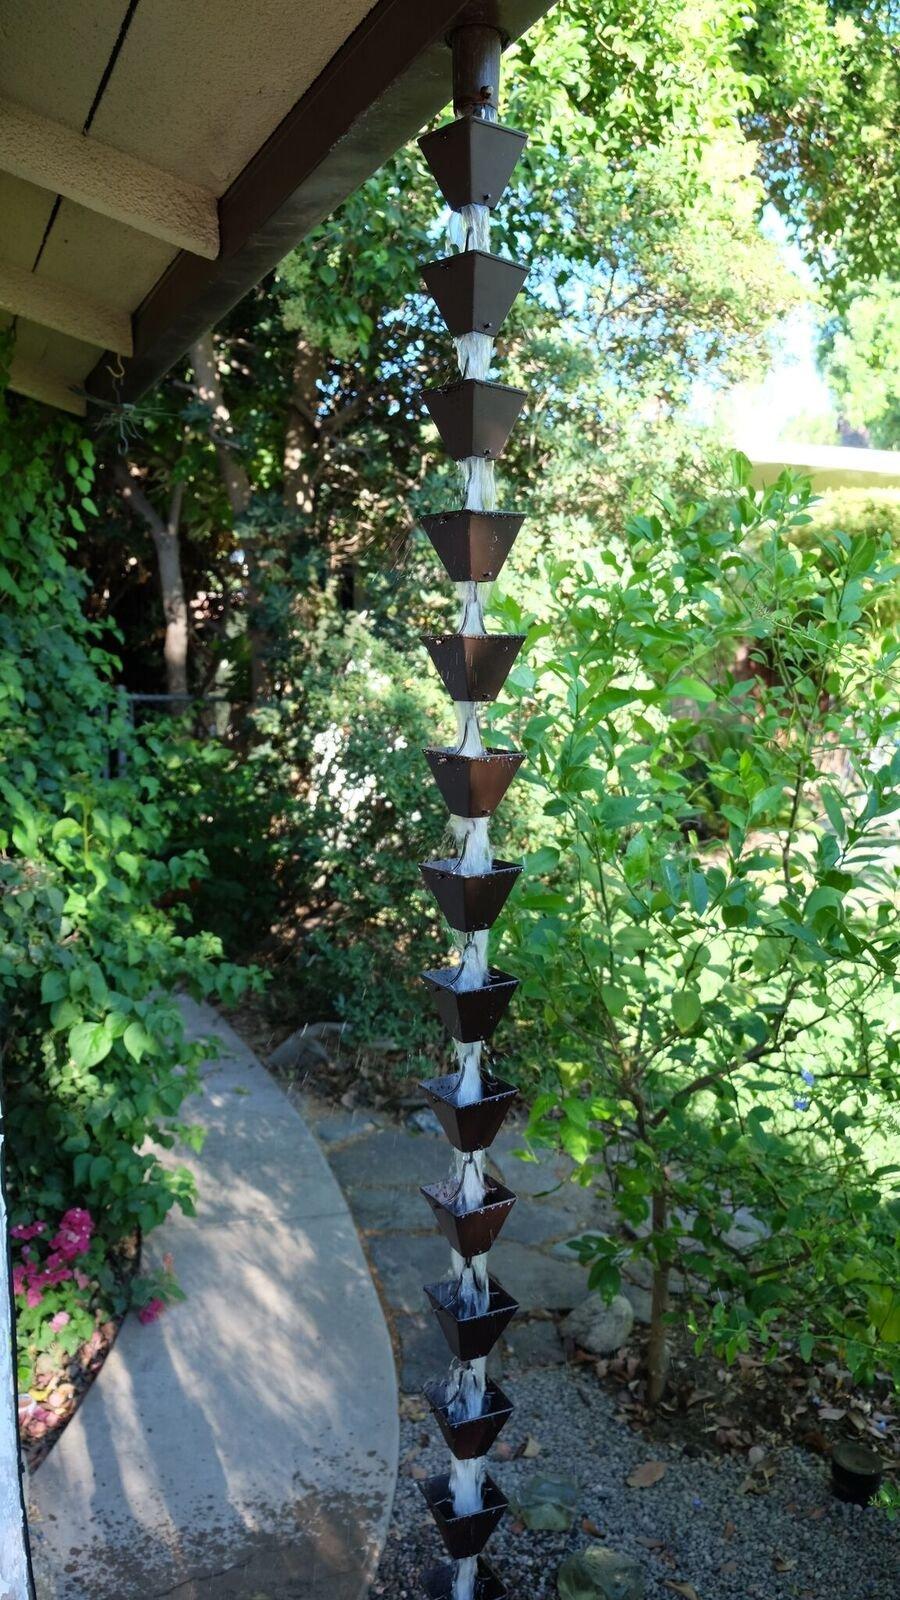 Rainchains, Inc. Medium Bronze Aluminum Square Cups RAIN Chain with Installation KIT (8.5 Feet)